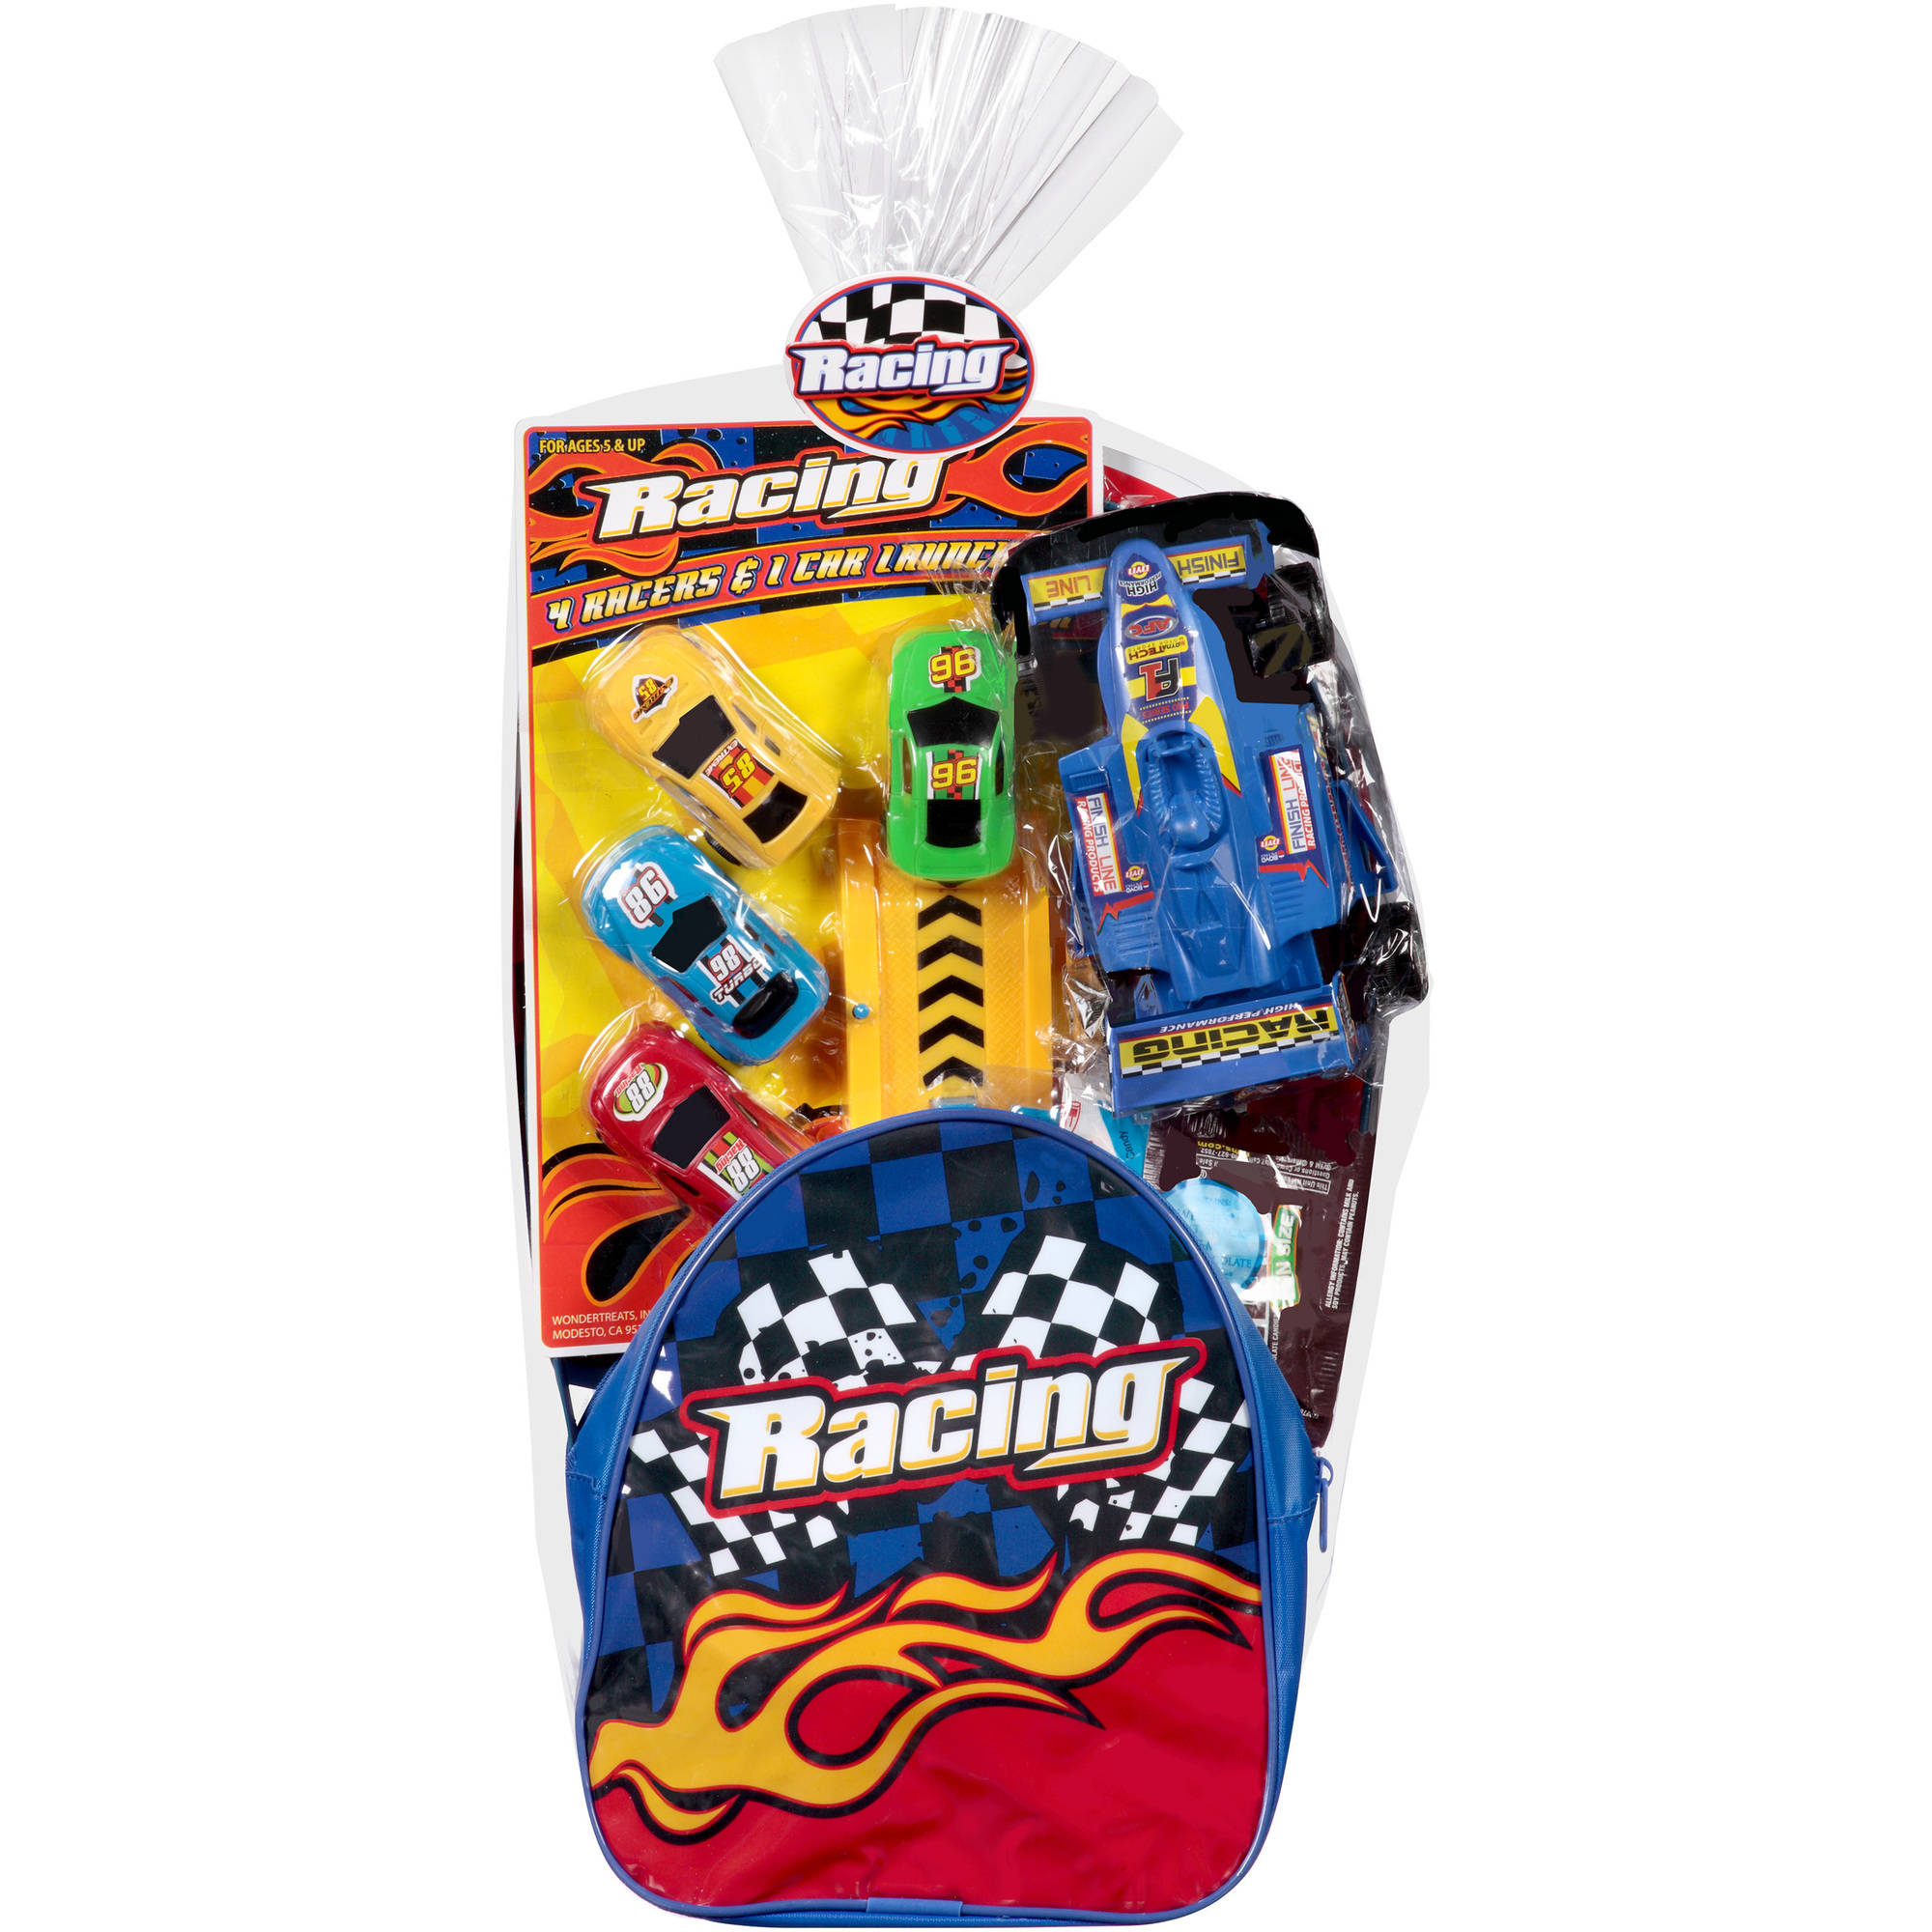 Wondertreats Racing Backpack W/ Toys Basket